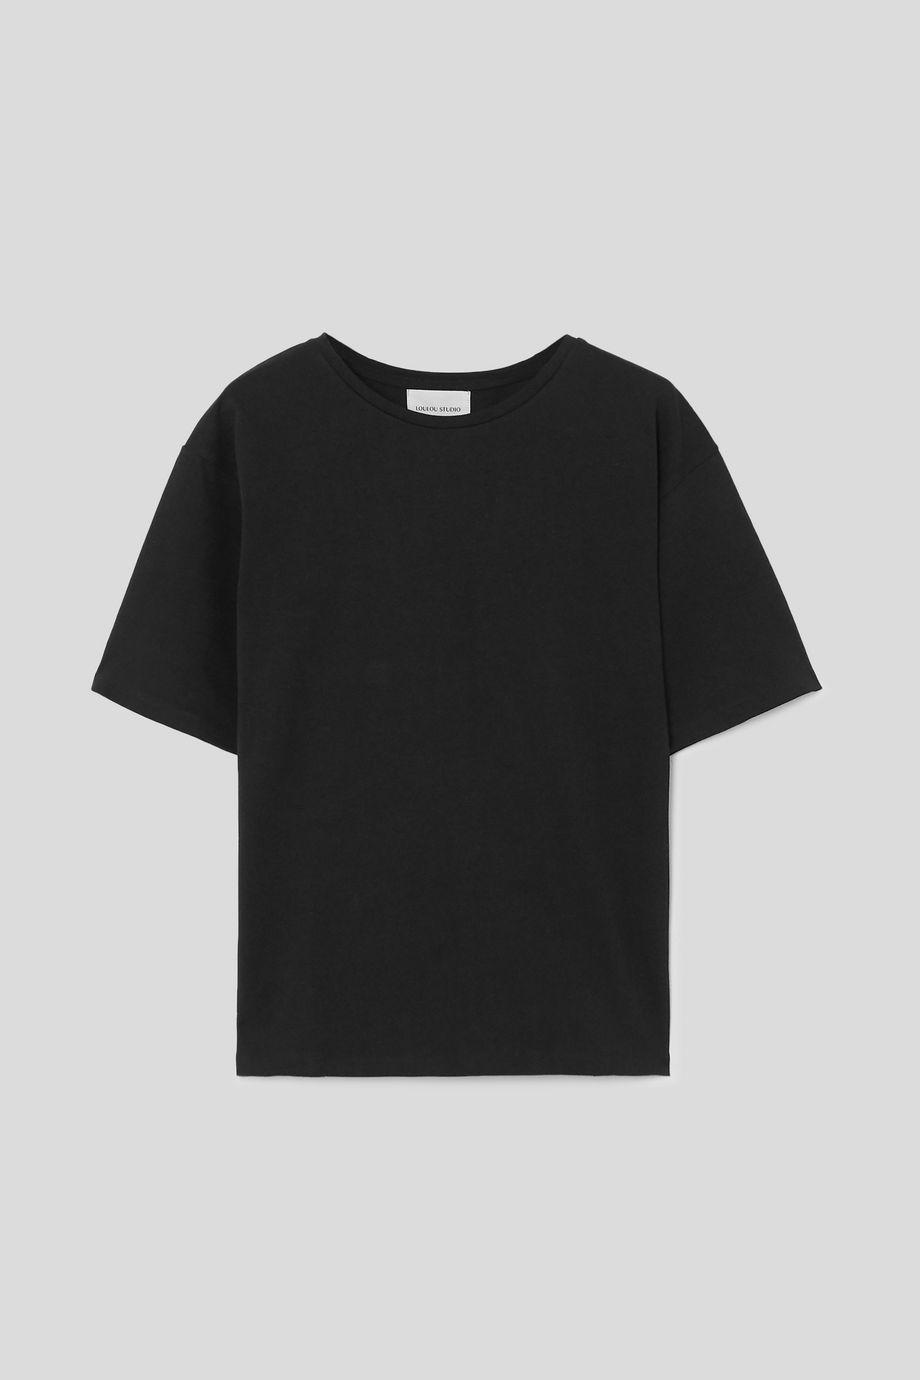 LOULOU STUDIO Lipari oversized cotton-jersey T-shirt